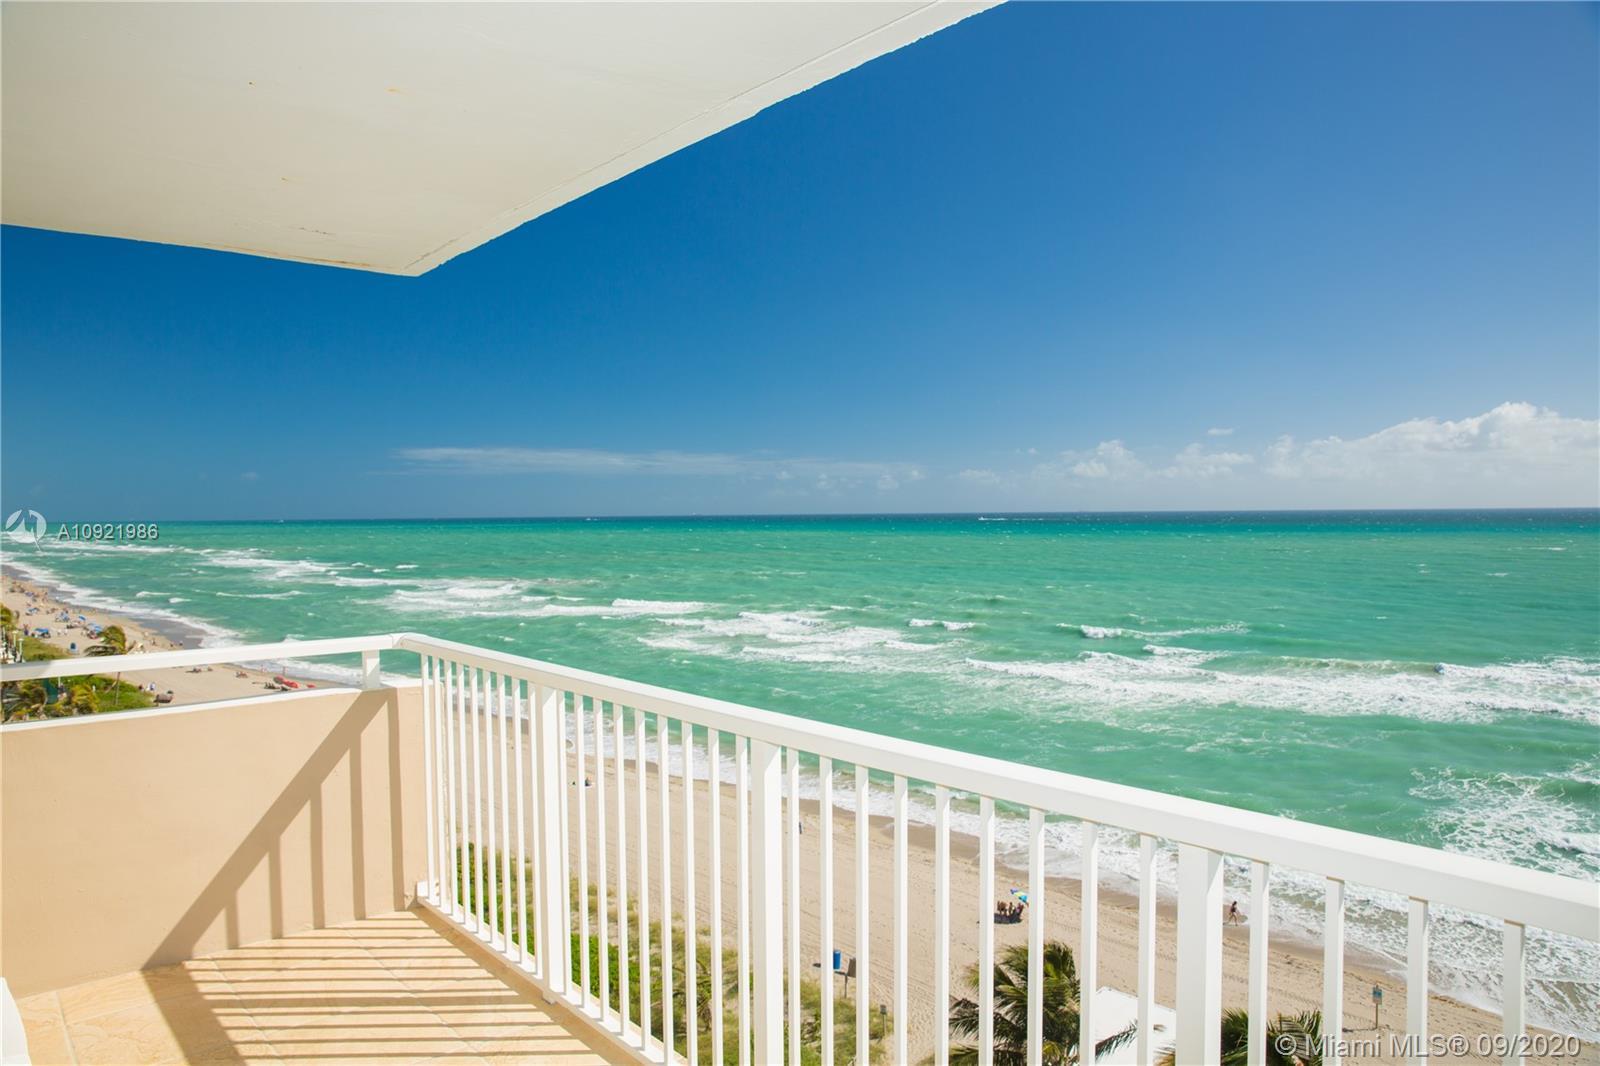 The Hemispheres One #8P - 1950 S Ocean Dr #8P, Hallandale Beach, FL 33009